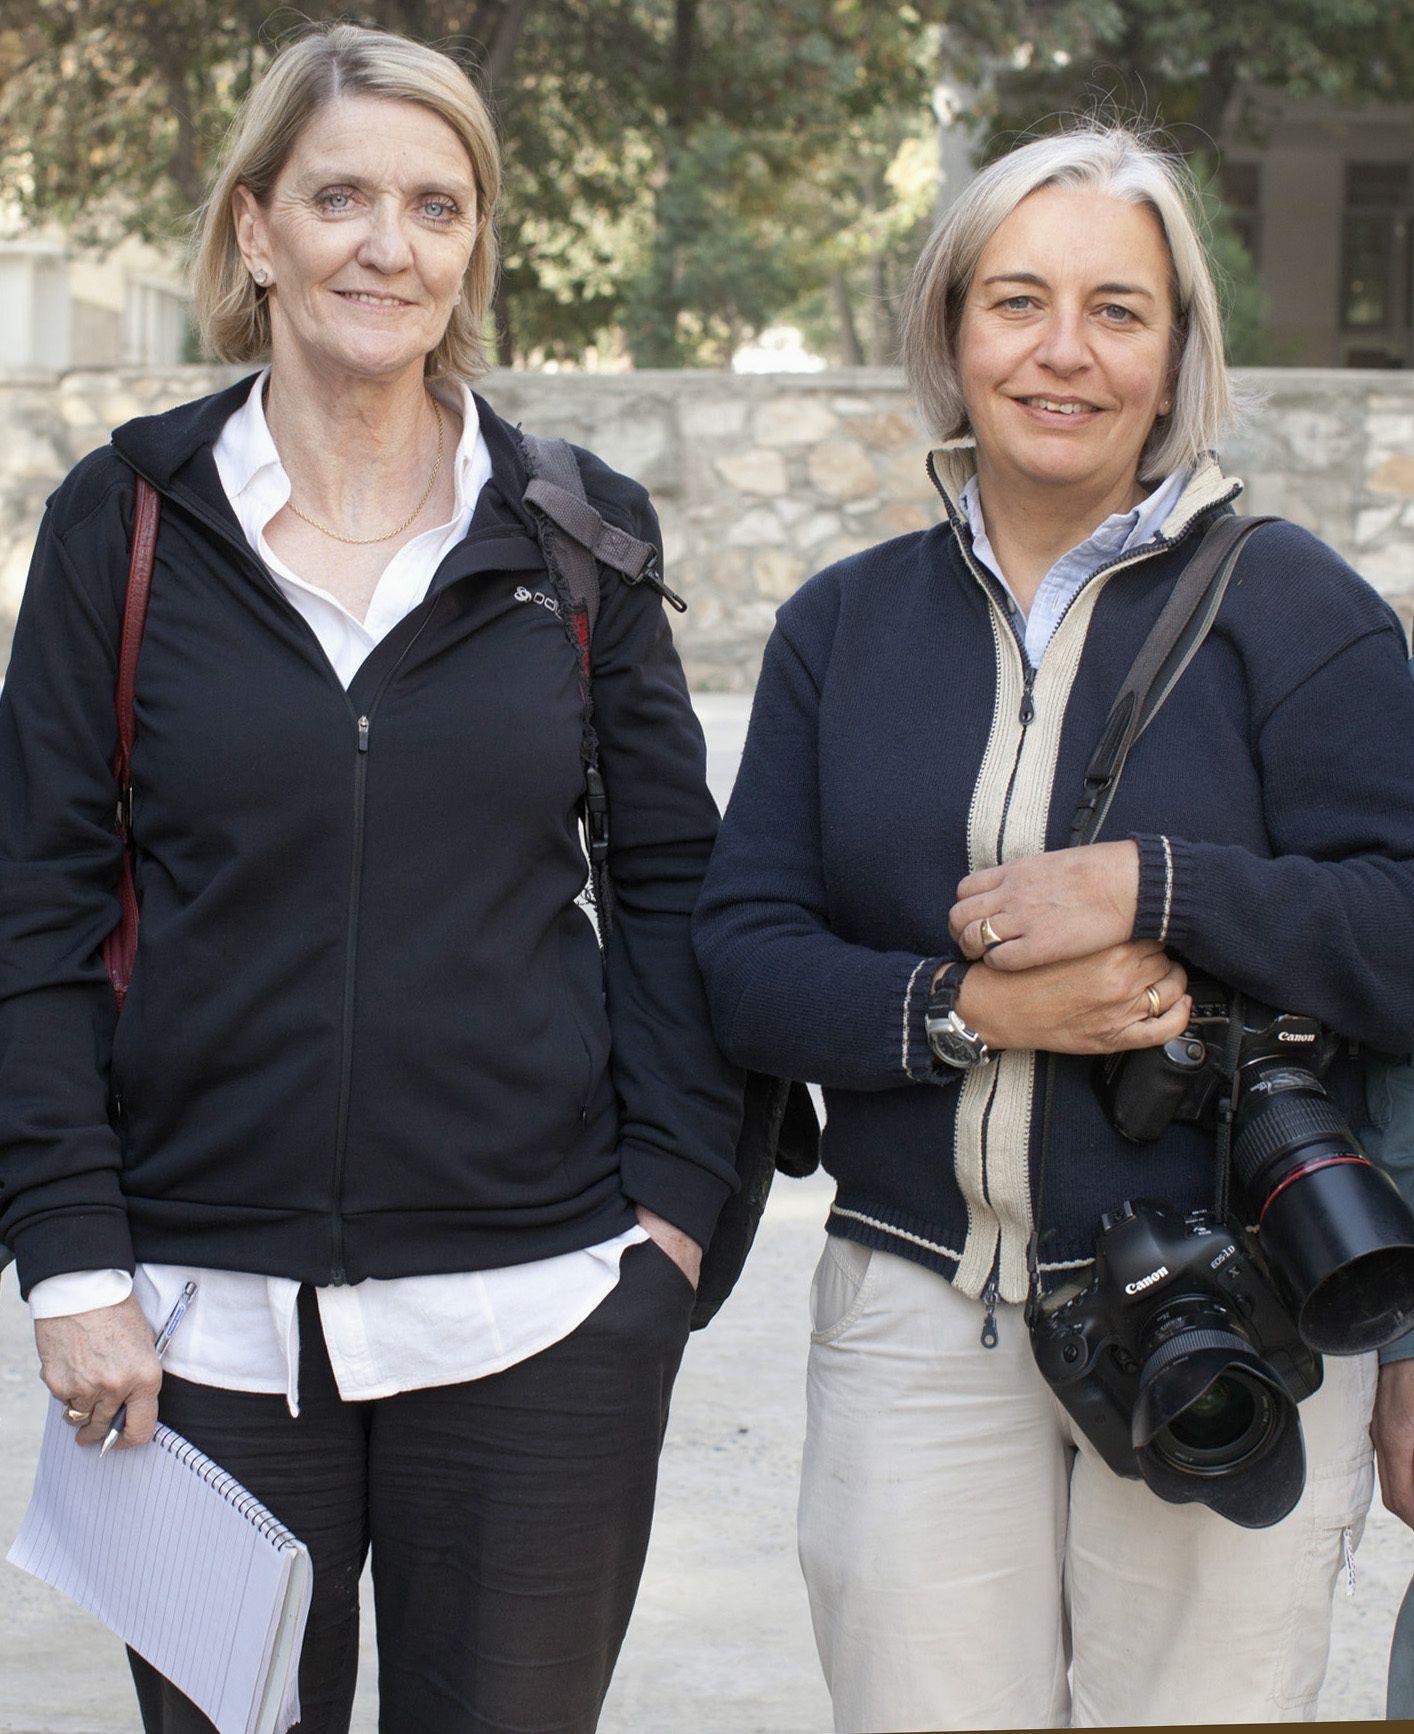 Kathy Gannon / Anja Niedringhaus